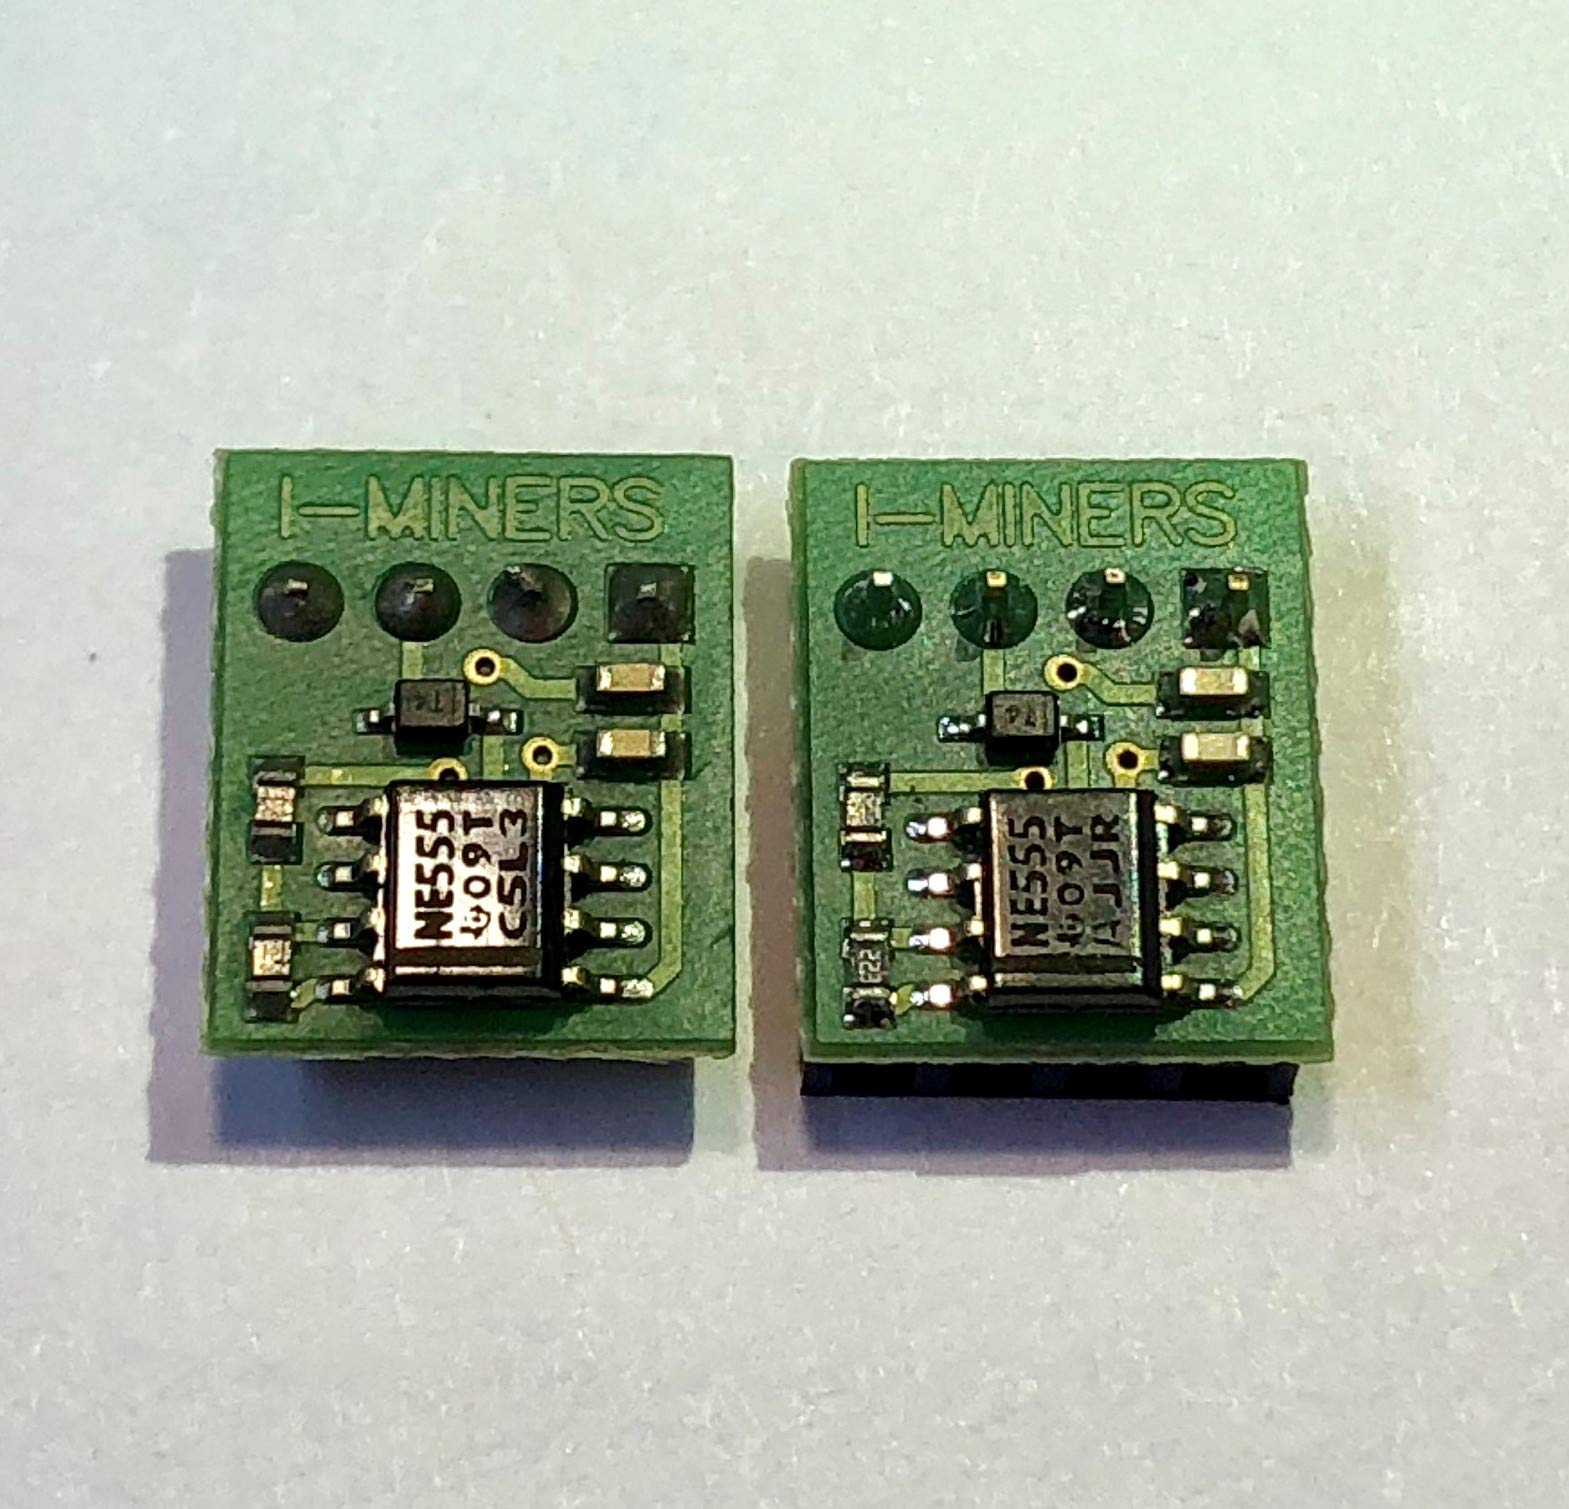 I-Miners Cooler Fan Simulator Emulator for Antminer S9 S11 S15 S17 D3 L3+  A3 T9 T15 T17 Z9 Z11 E3 DR5 E3 Oil 3M Novec - Pack of 2